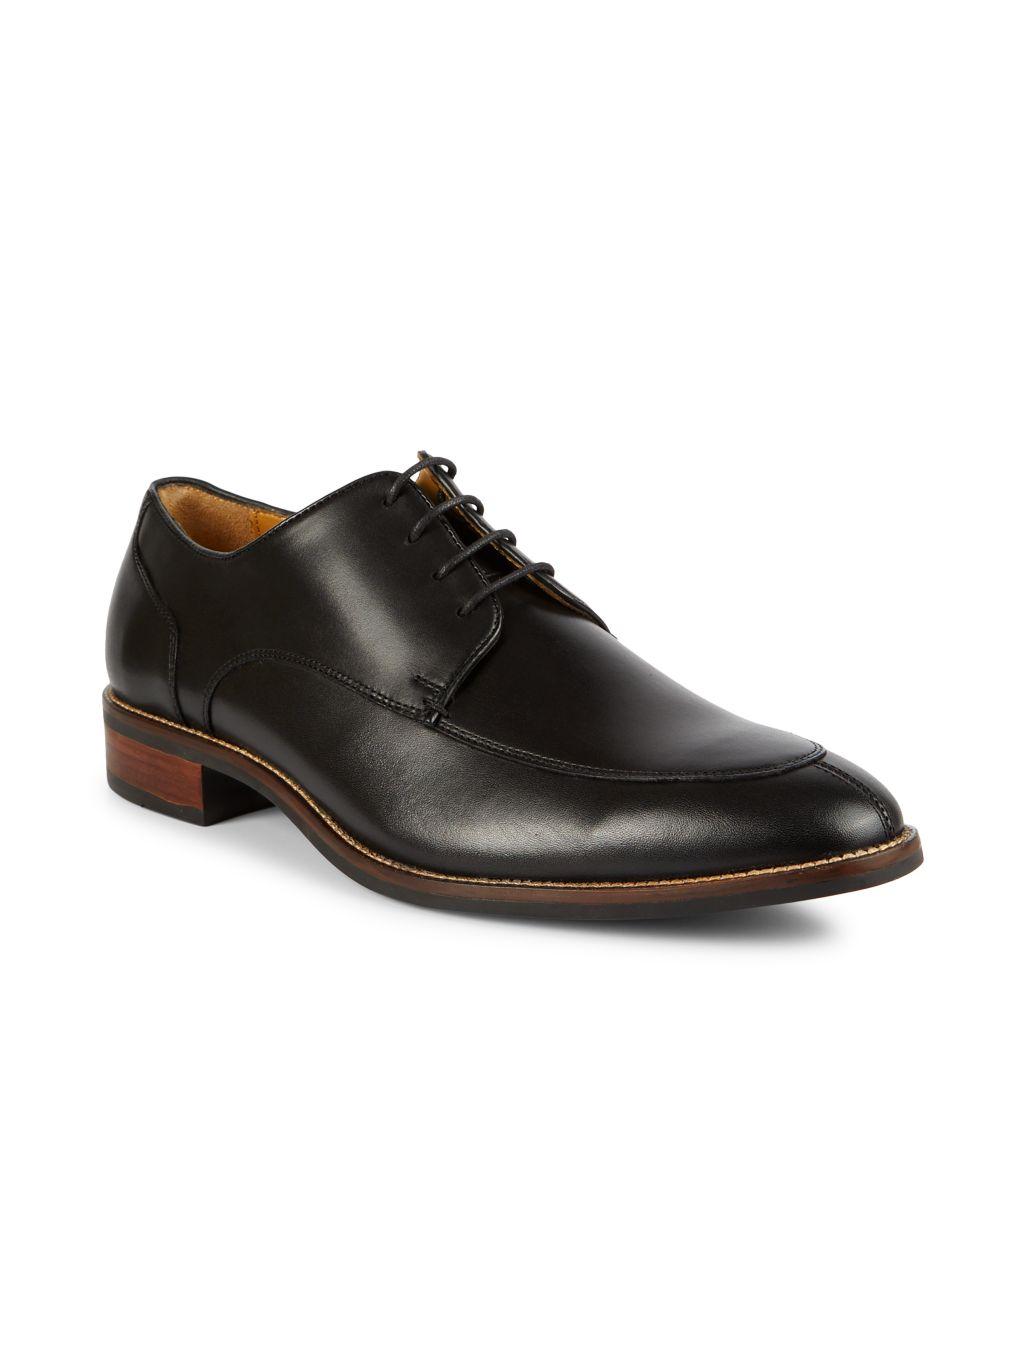 Cole Haan Lenox Hill Derby Dress Shoes